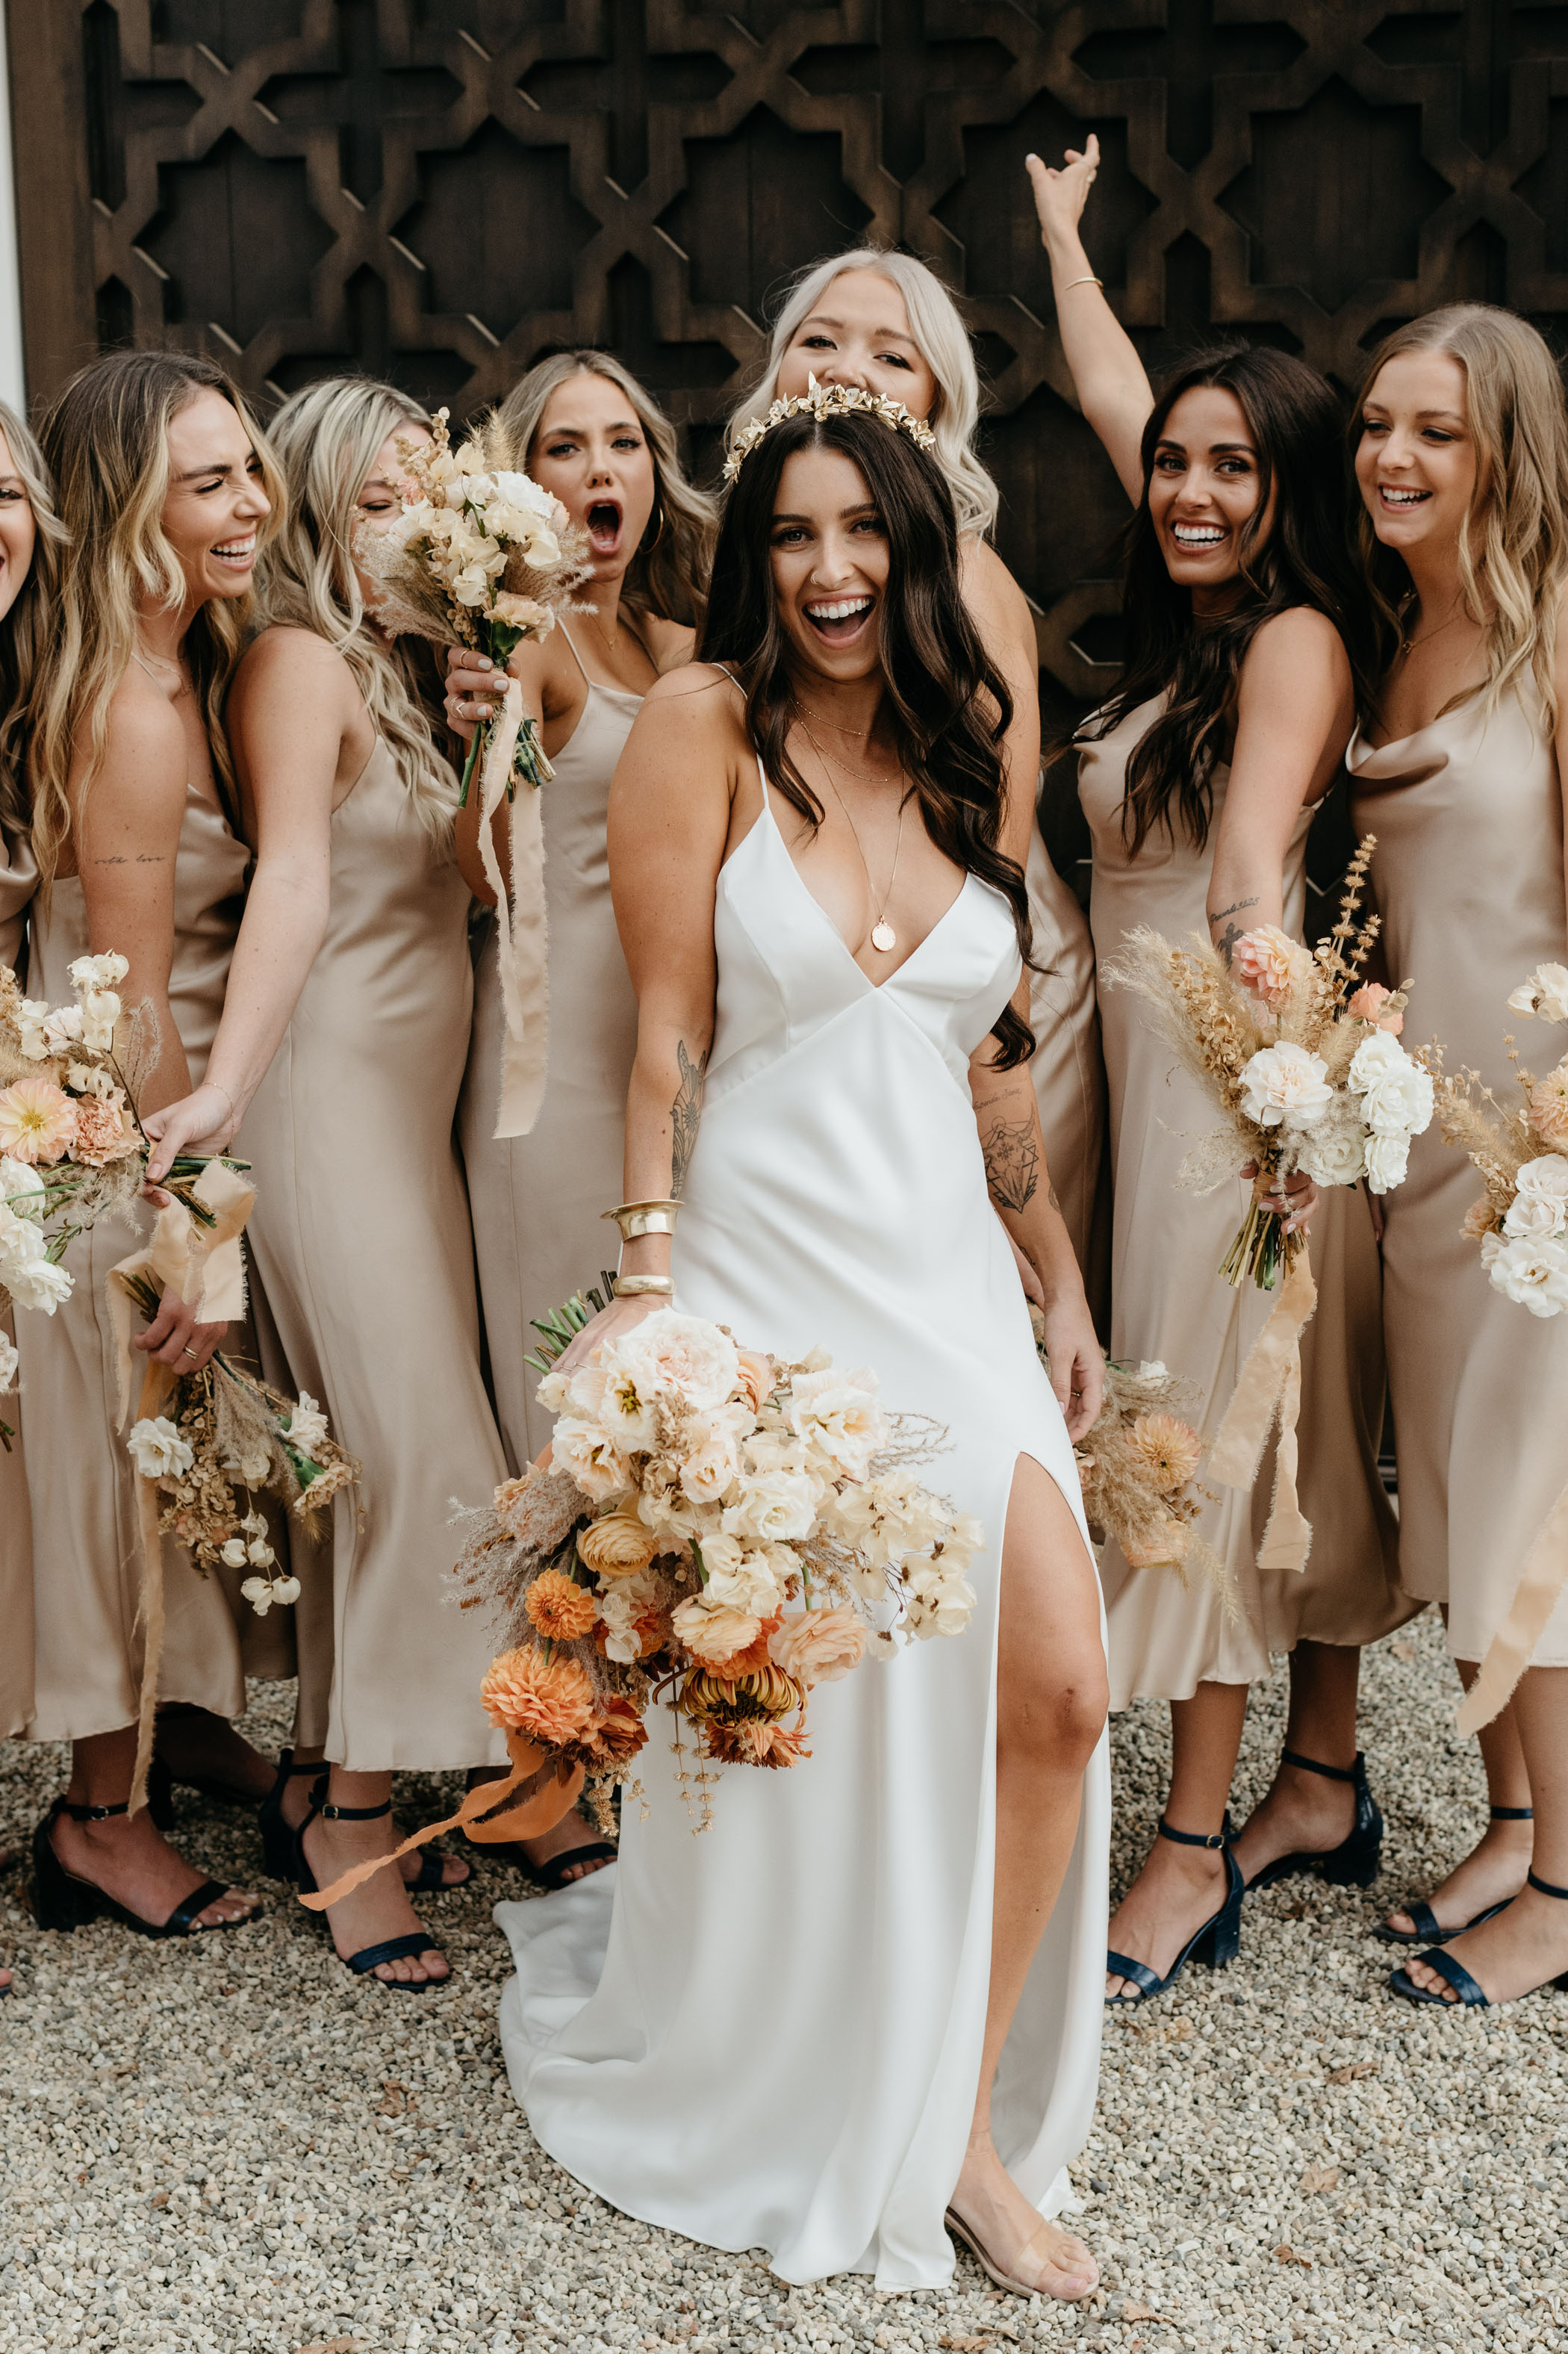 Satin Slip Bridesmaid Dresses